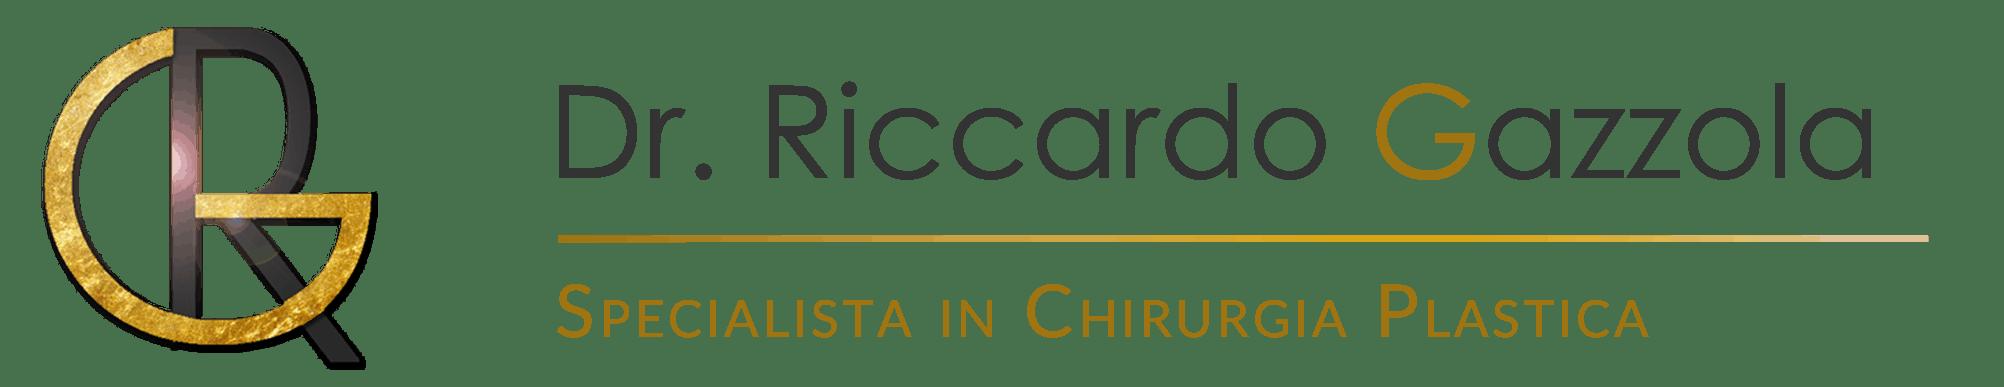 Chirurgo Plastico Dott. Riccardo Gazzola Logo